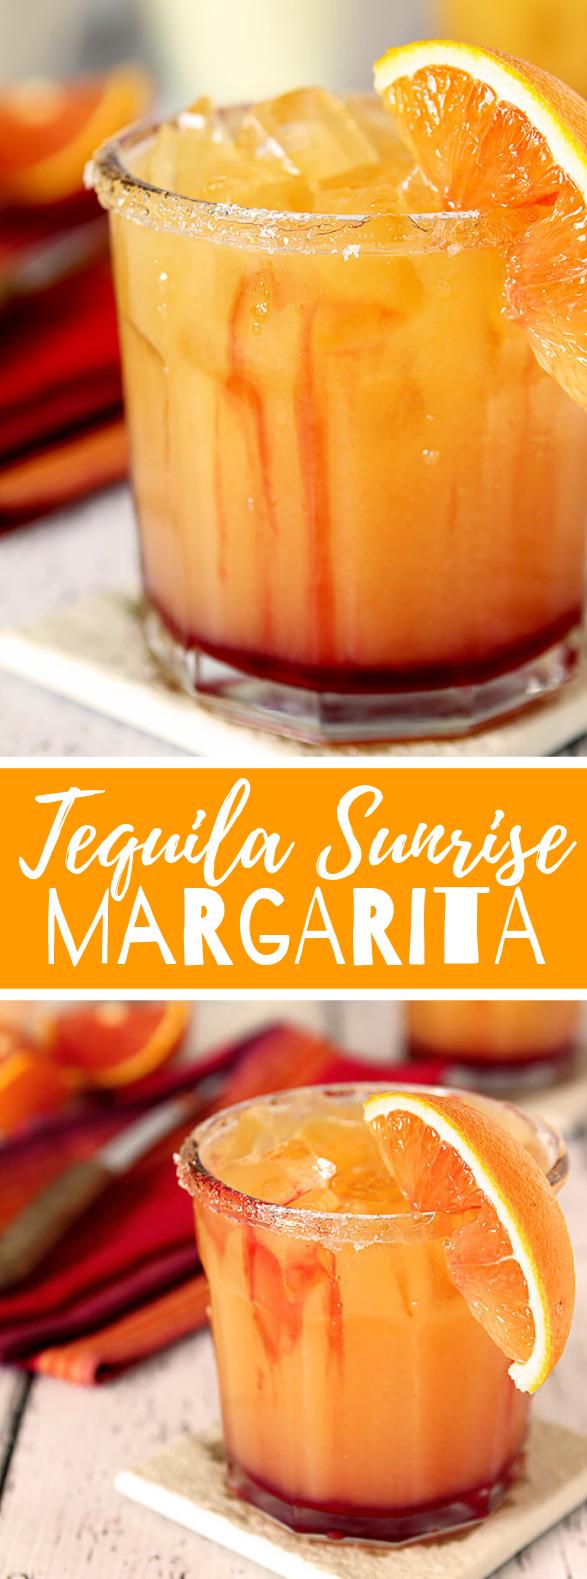 Tequila Sunrise Margarita #drink #freshdrink